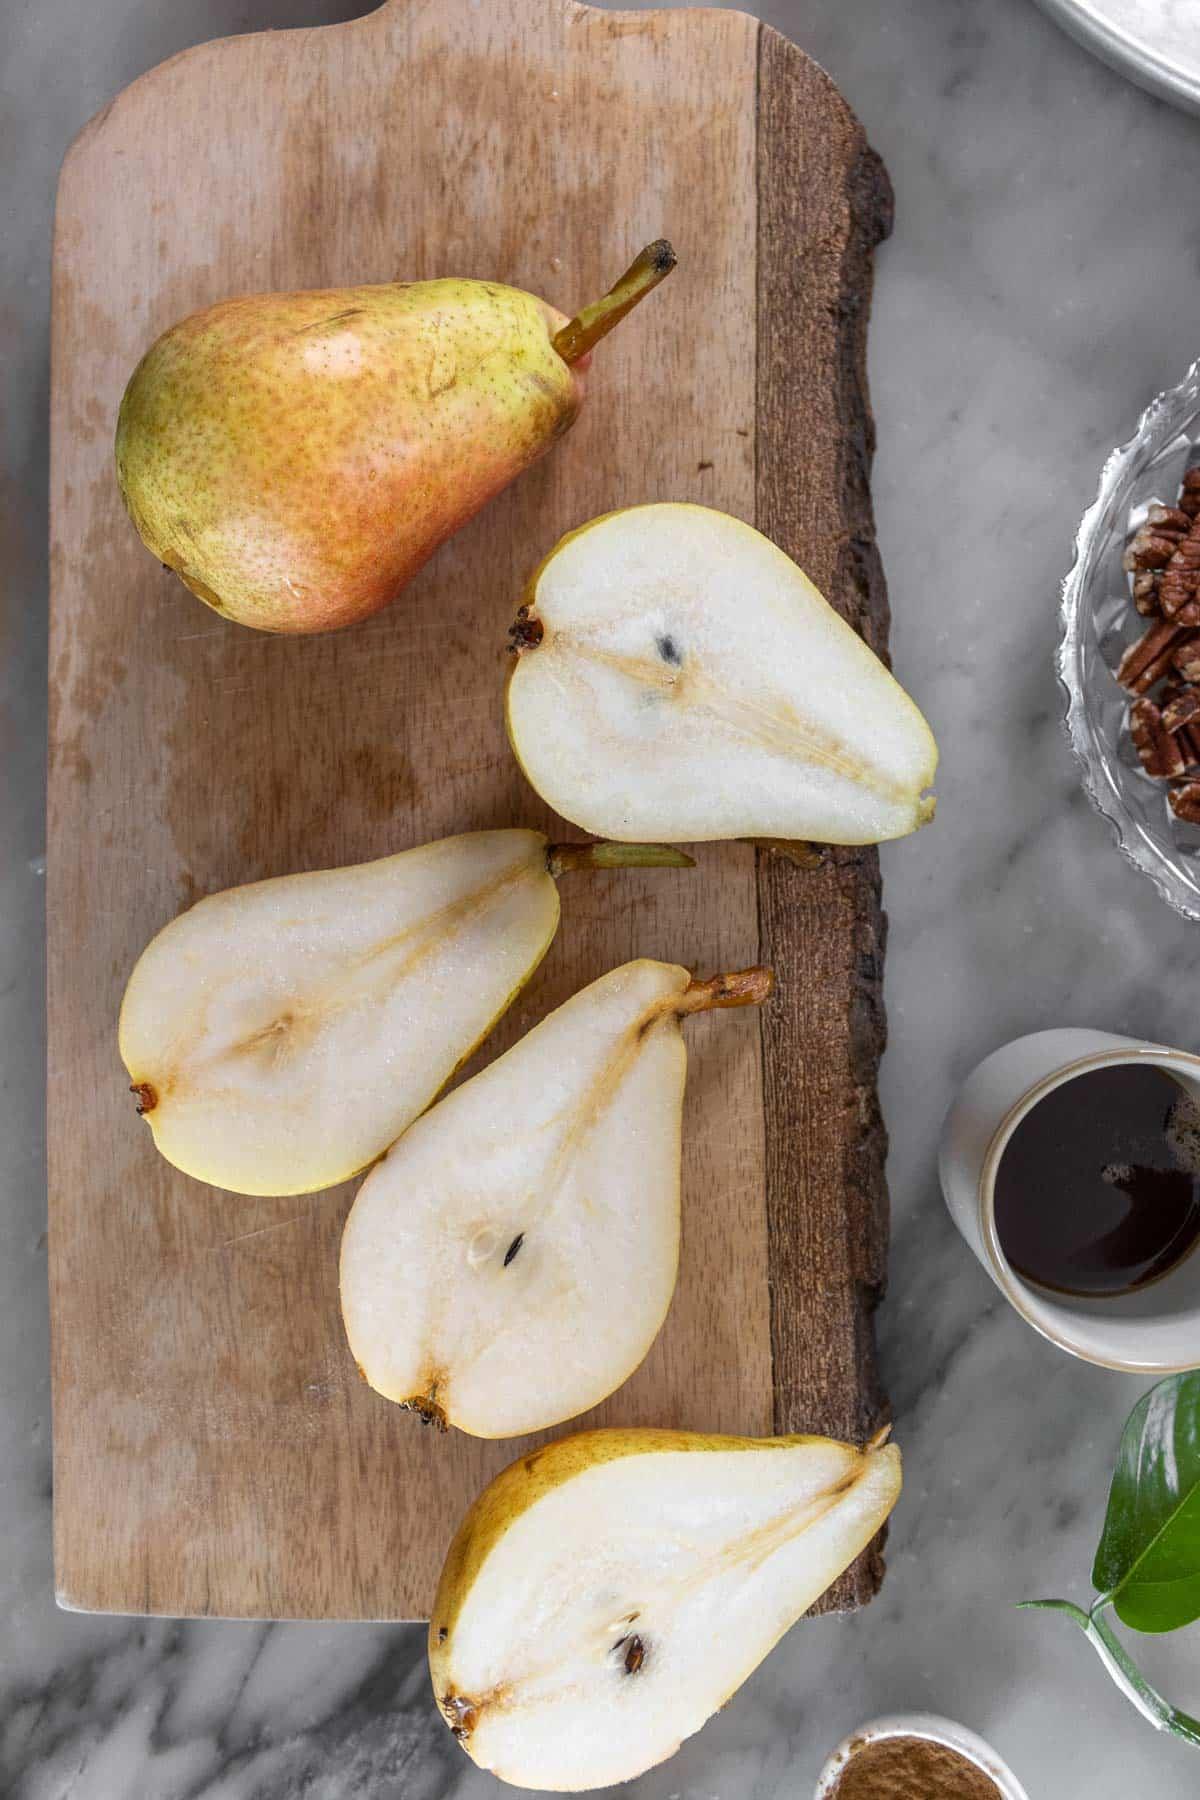 pears cut in half